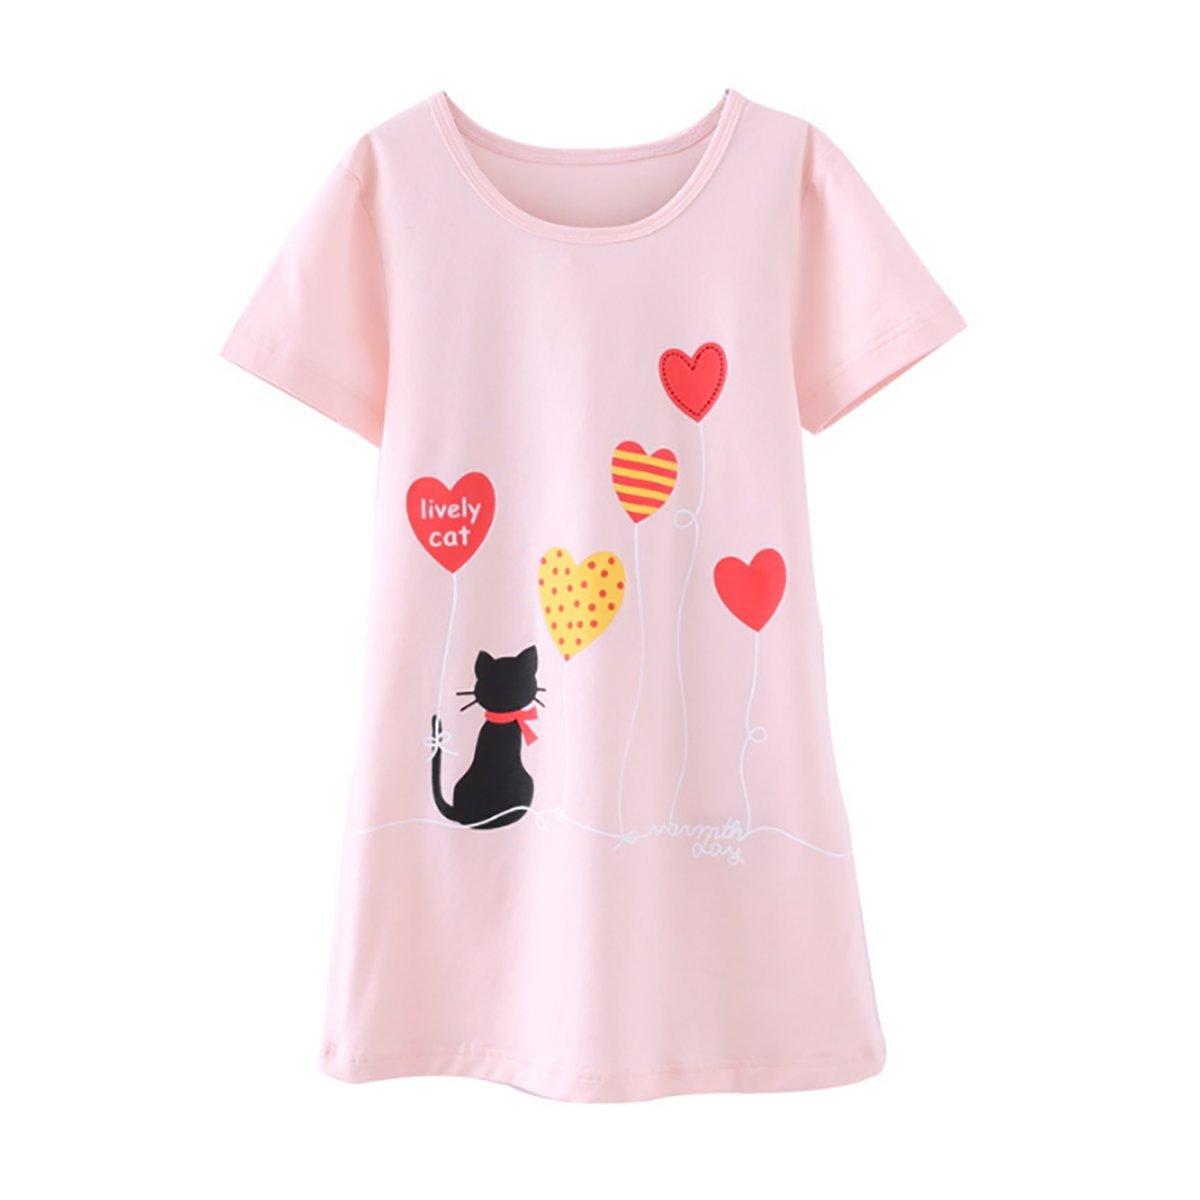 DGAGA Little Girls Cute Cotton Floral Nightgown Sleepwear Pajamas Sleep Dresses Pink 7-8 Years /140cm